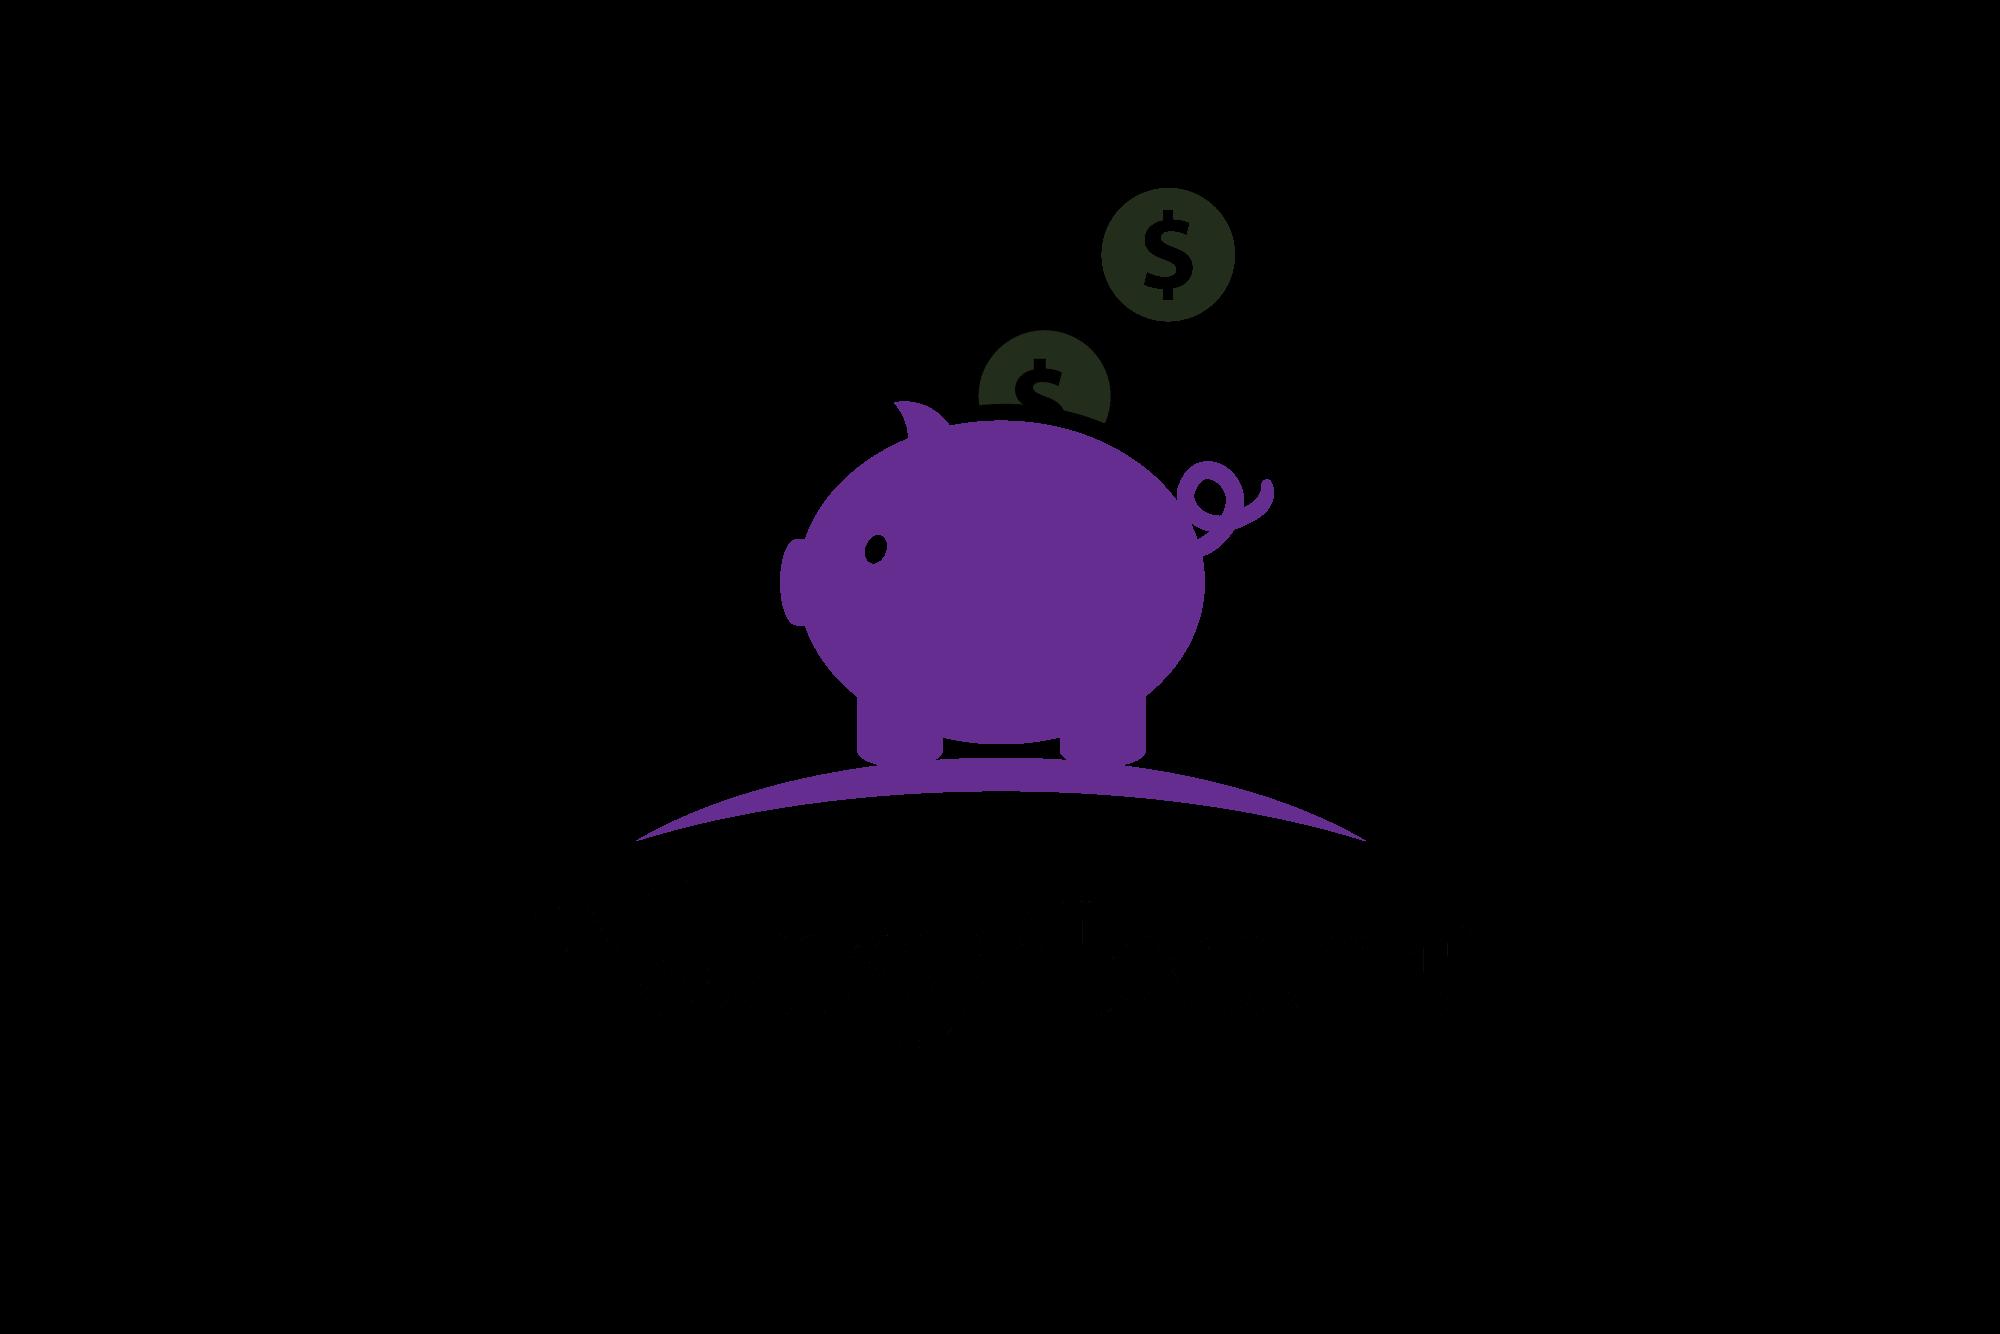 http://mazepress.com/wp-content/uploads/2017/07/financial-logo.png